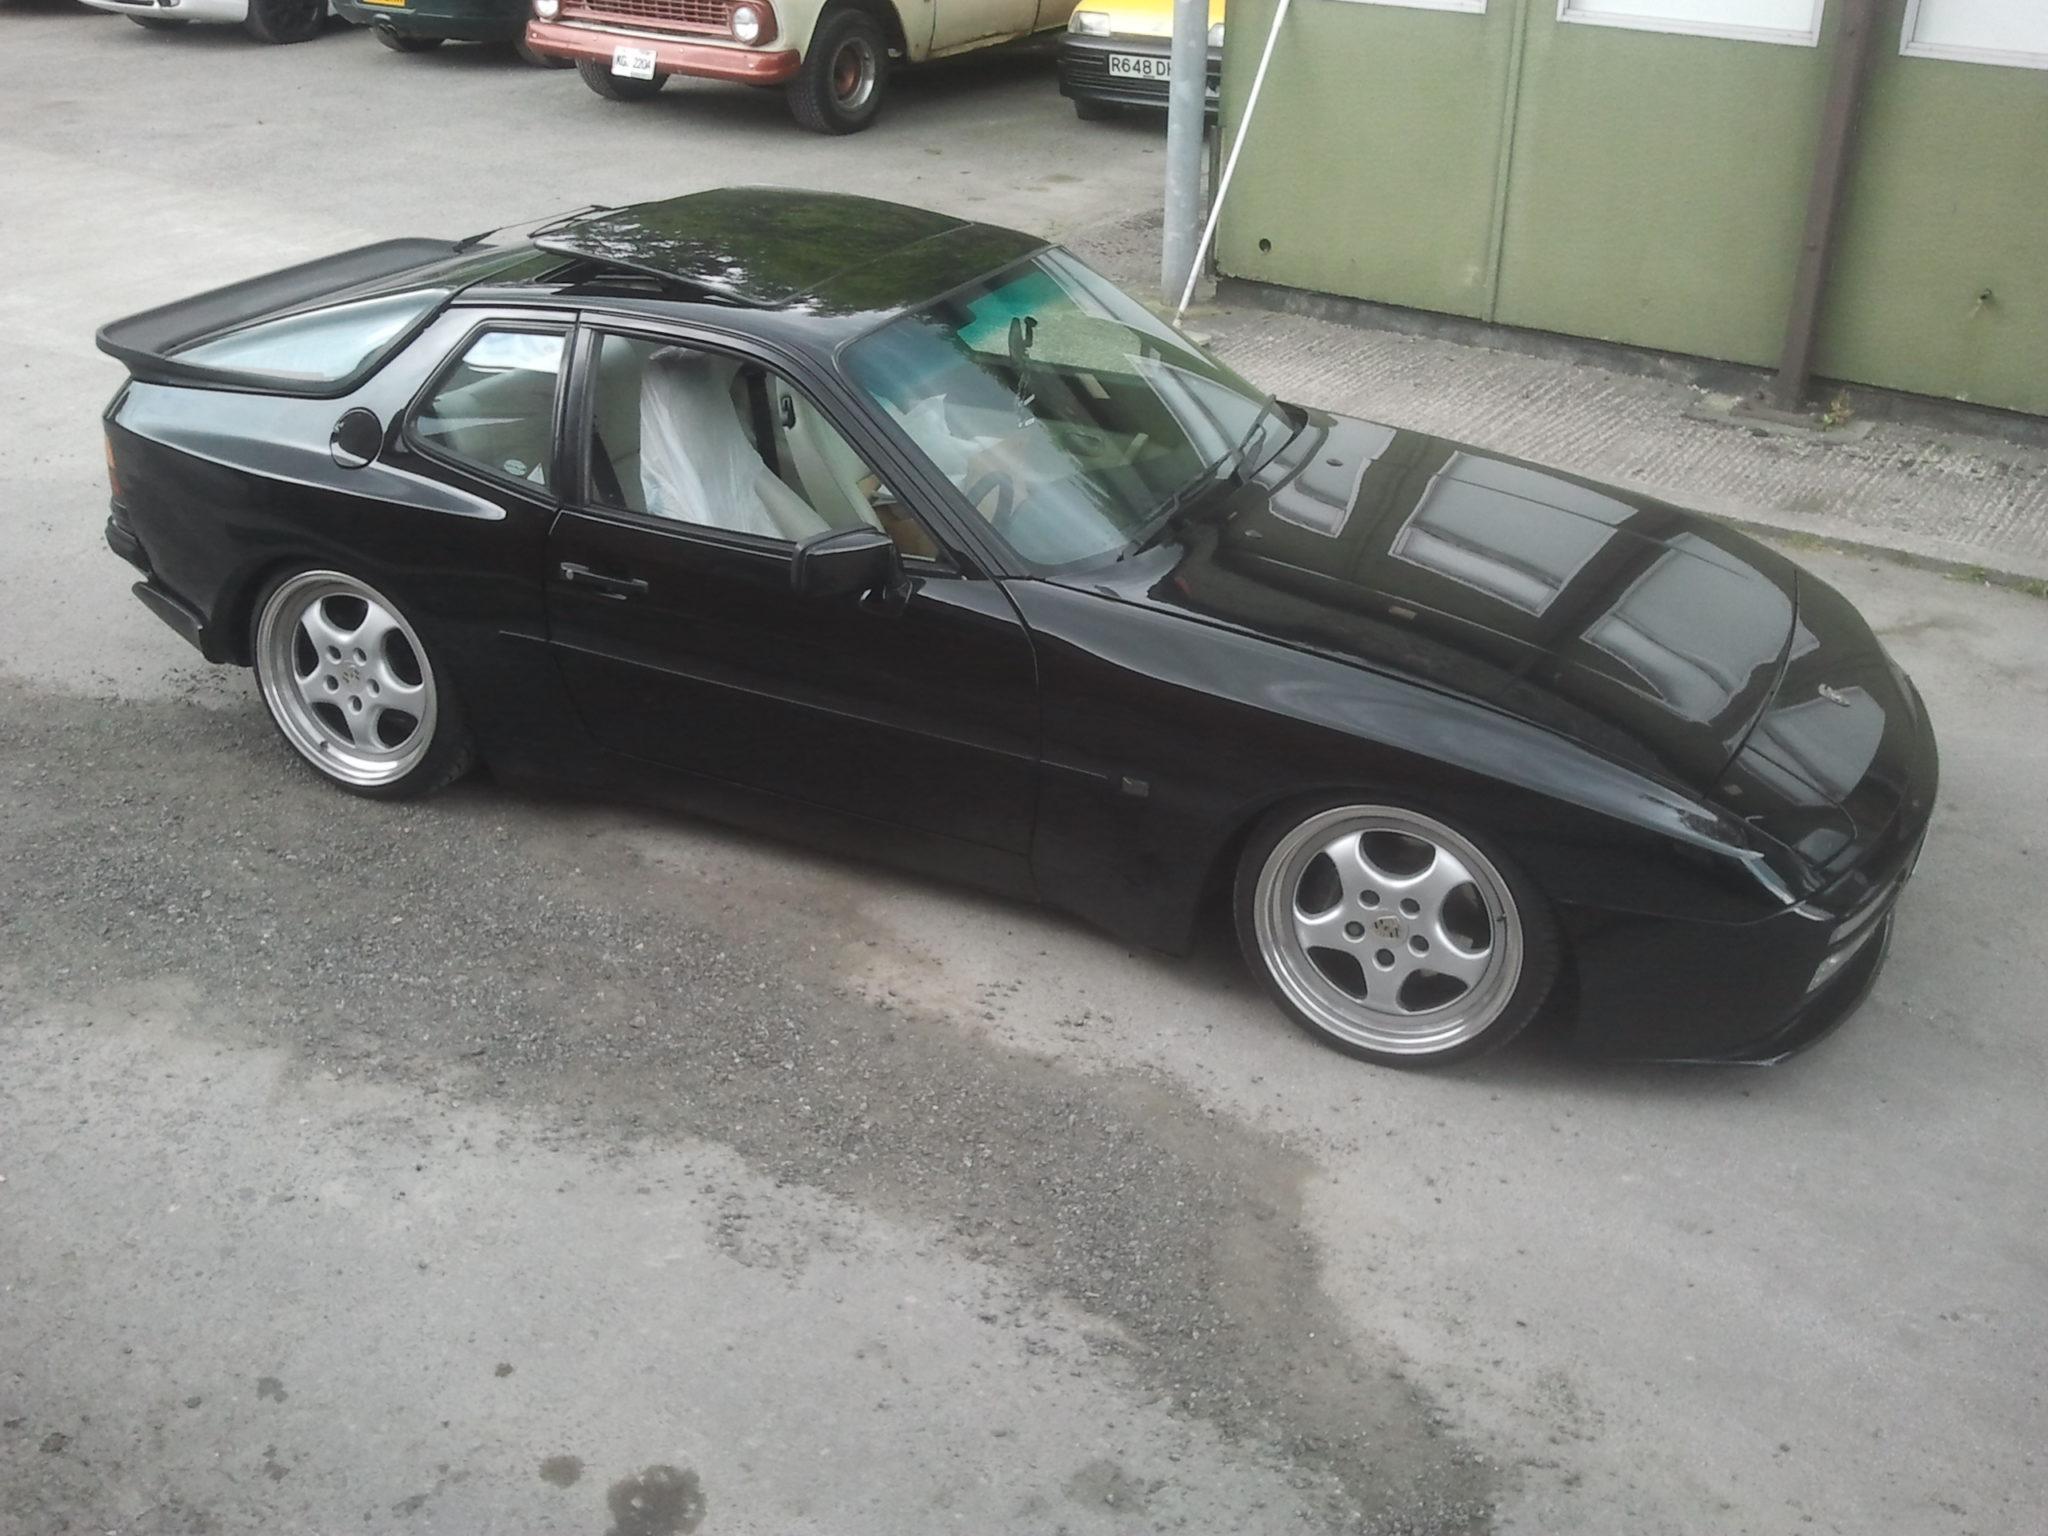 Max S Super Low 944 S2 Independent Porsche Specialist In Yorkshire